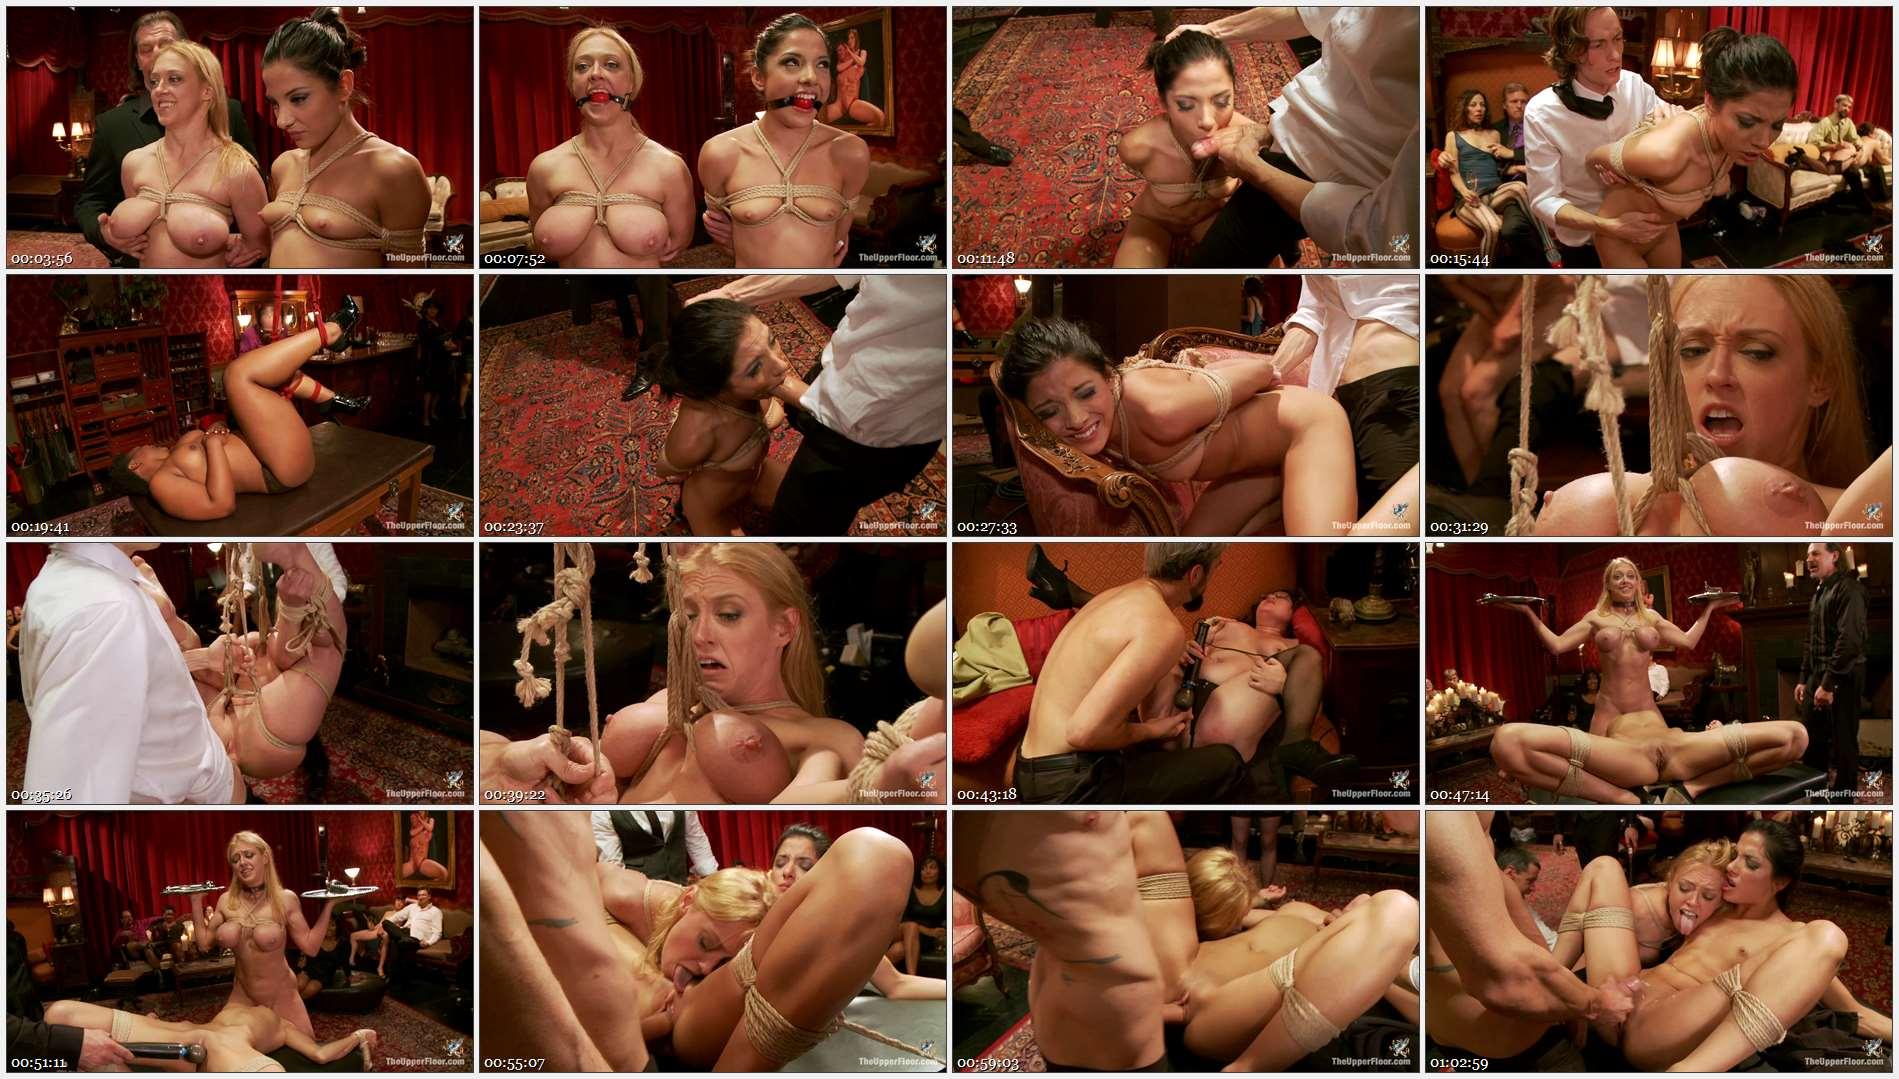 Evilyn Fierce – Owen Gray – Dee Williams – Big Tits Blonde Slave Suspended for Anal Fuck vs. Petite Cock Sucker